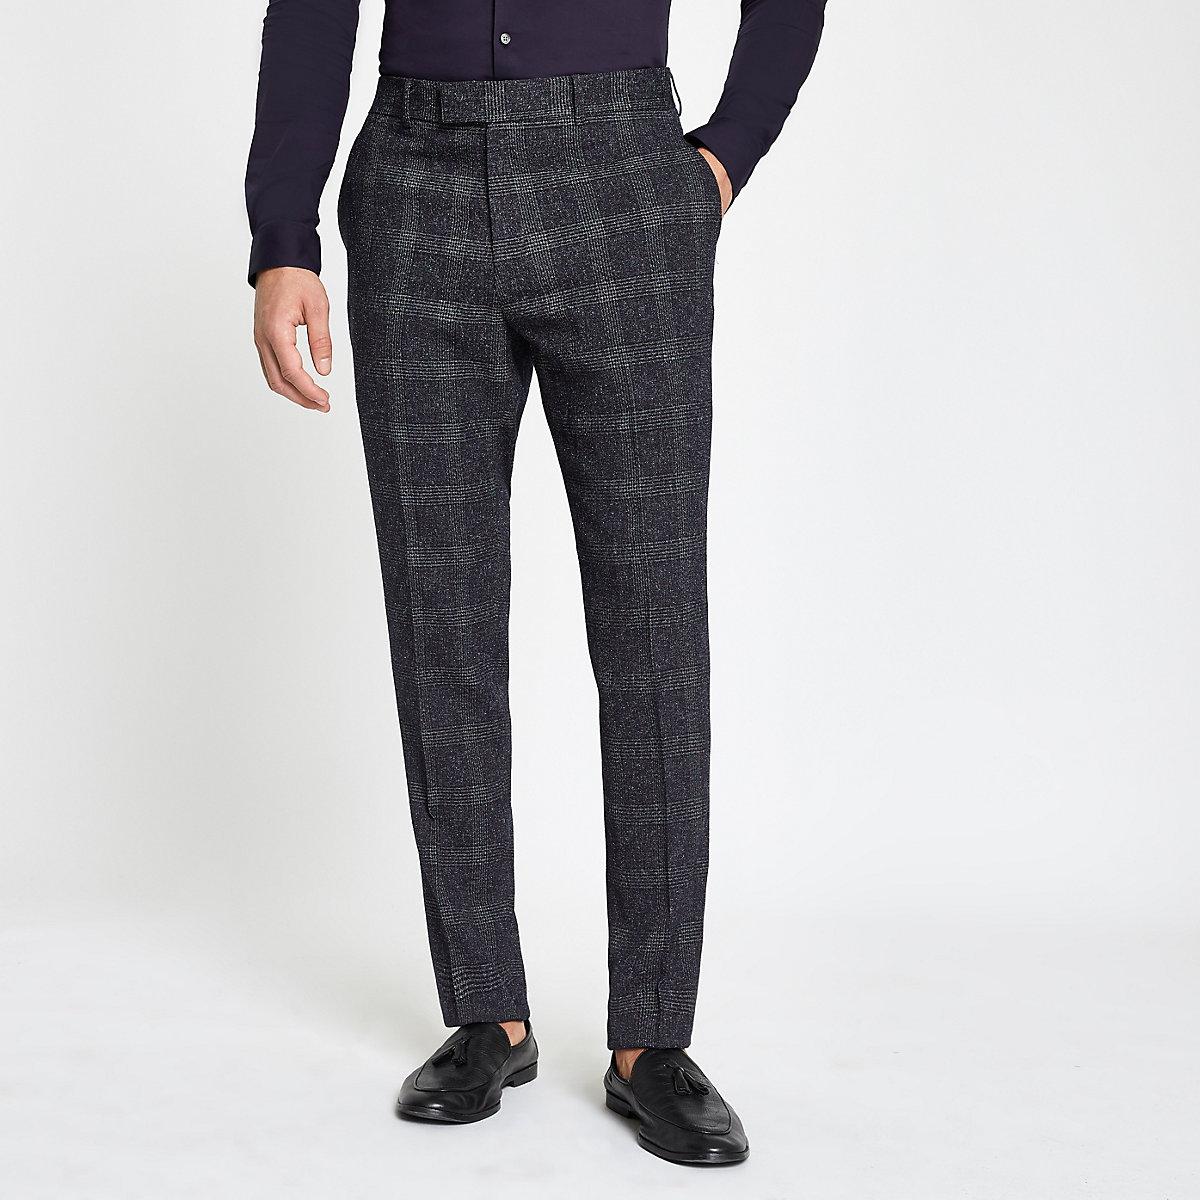 Farah blue check skinny suit pants